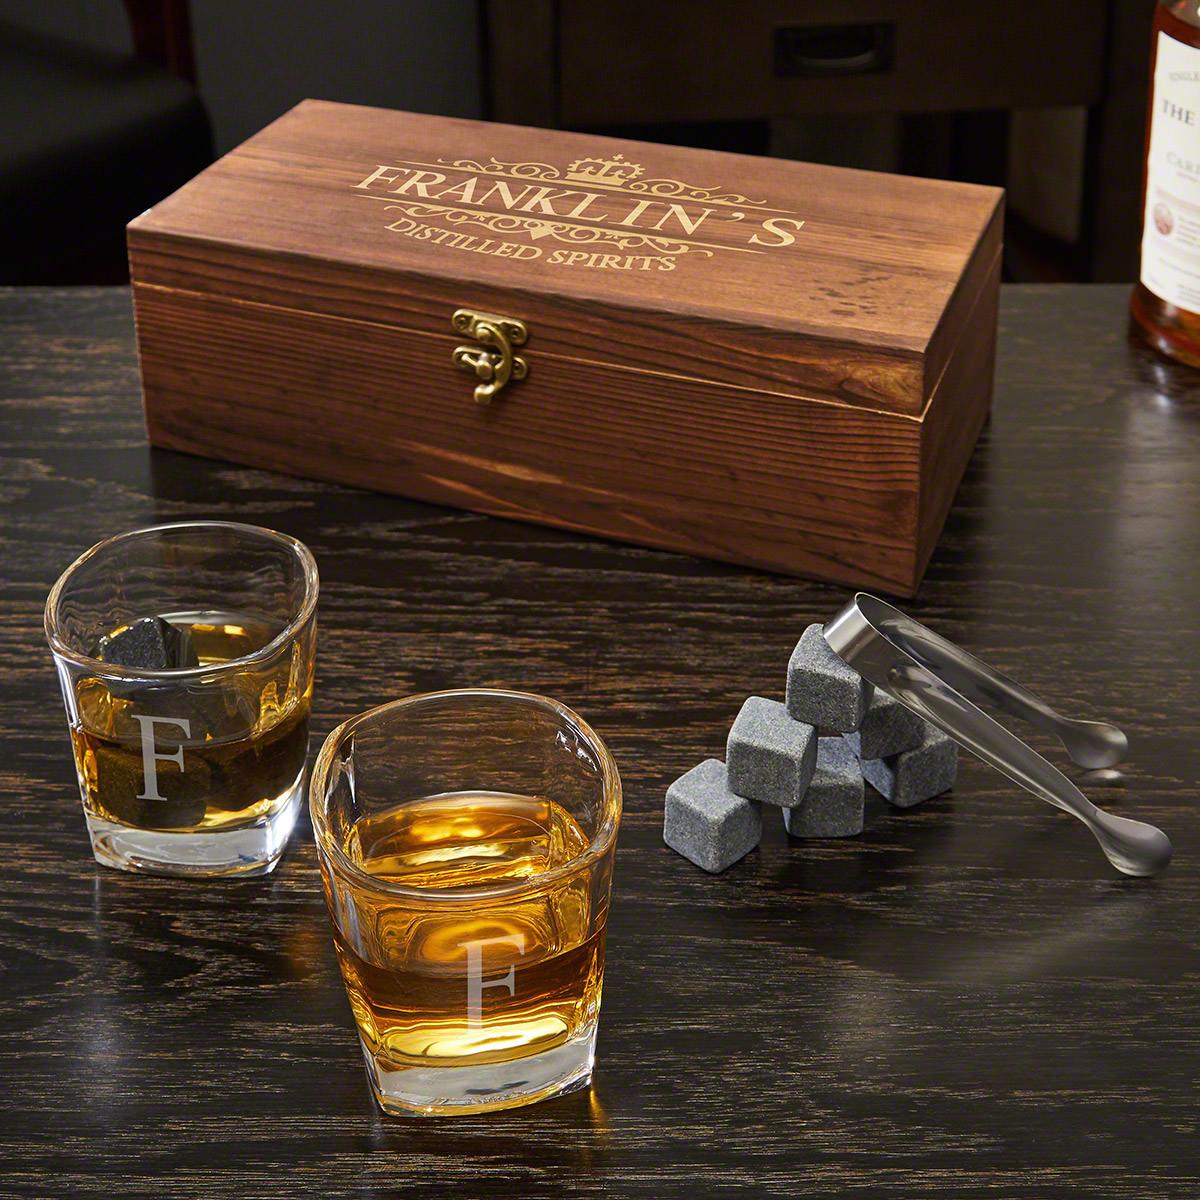 Kensington Personalized 6 Oz Shot Glasses and Whiskey Stones Gift Set